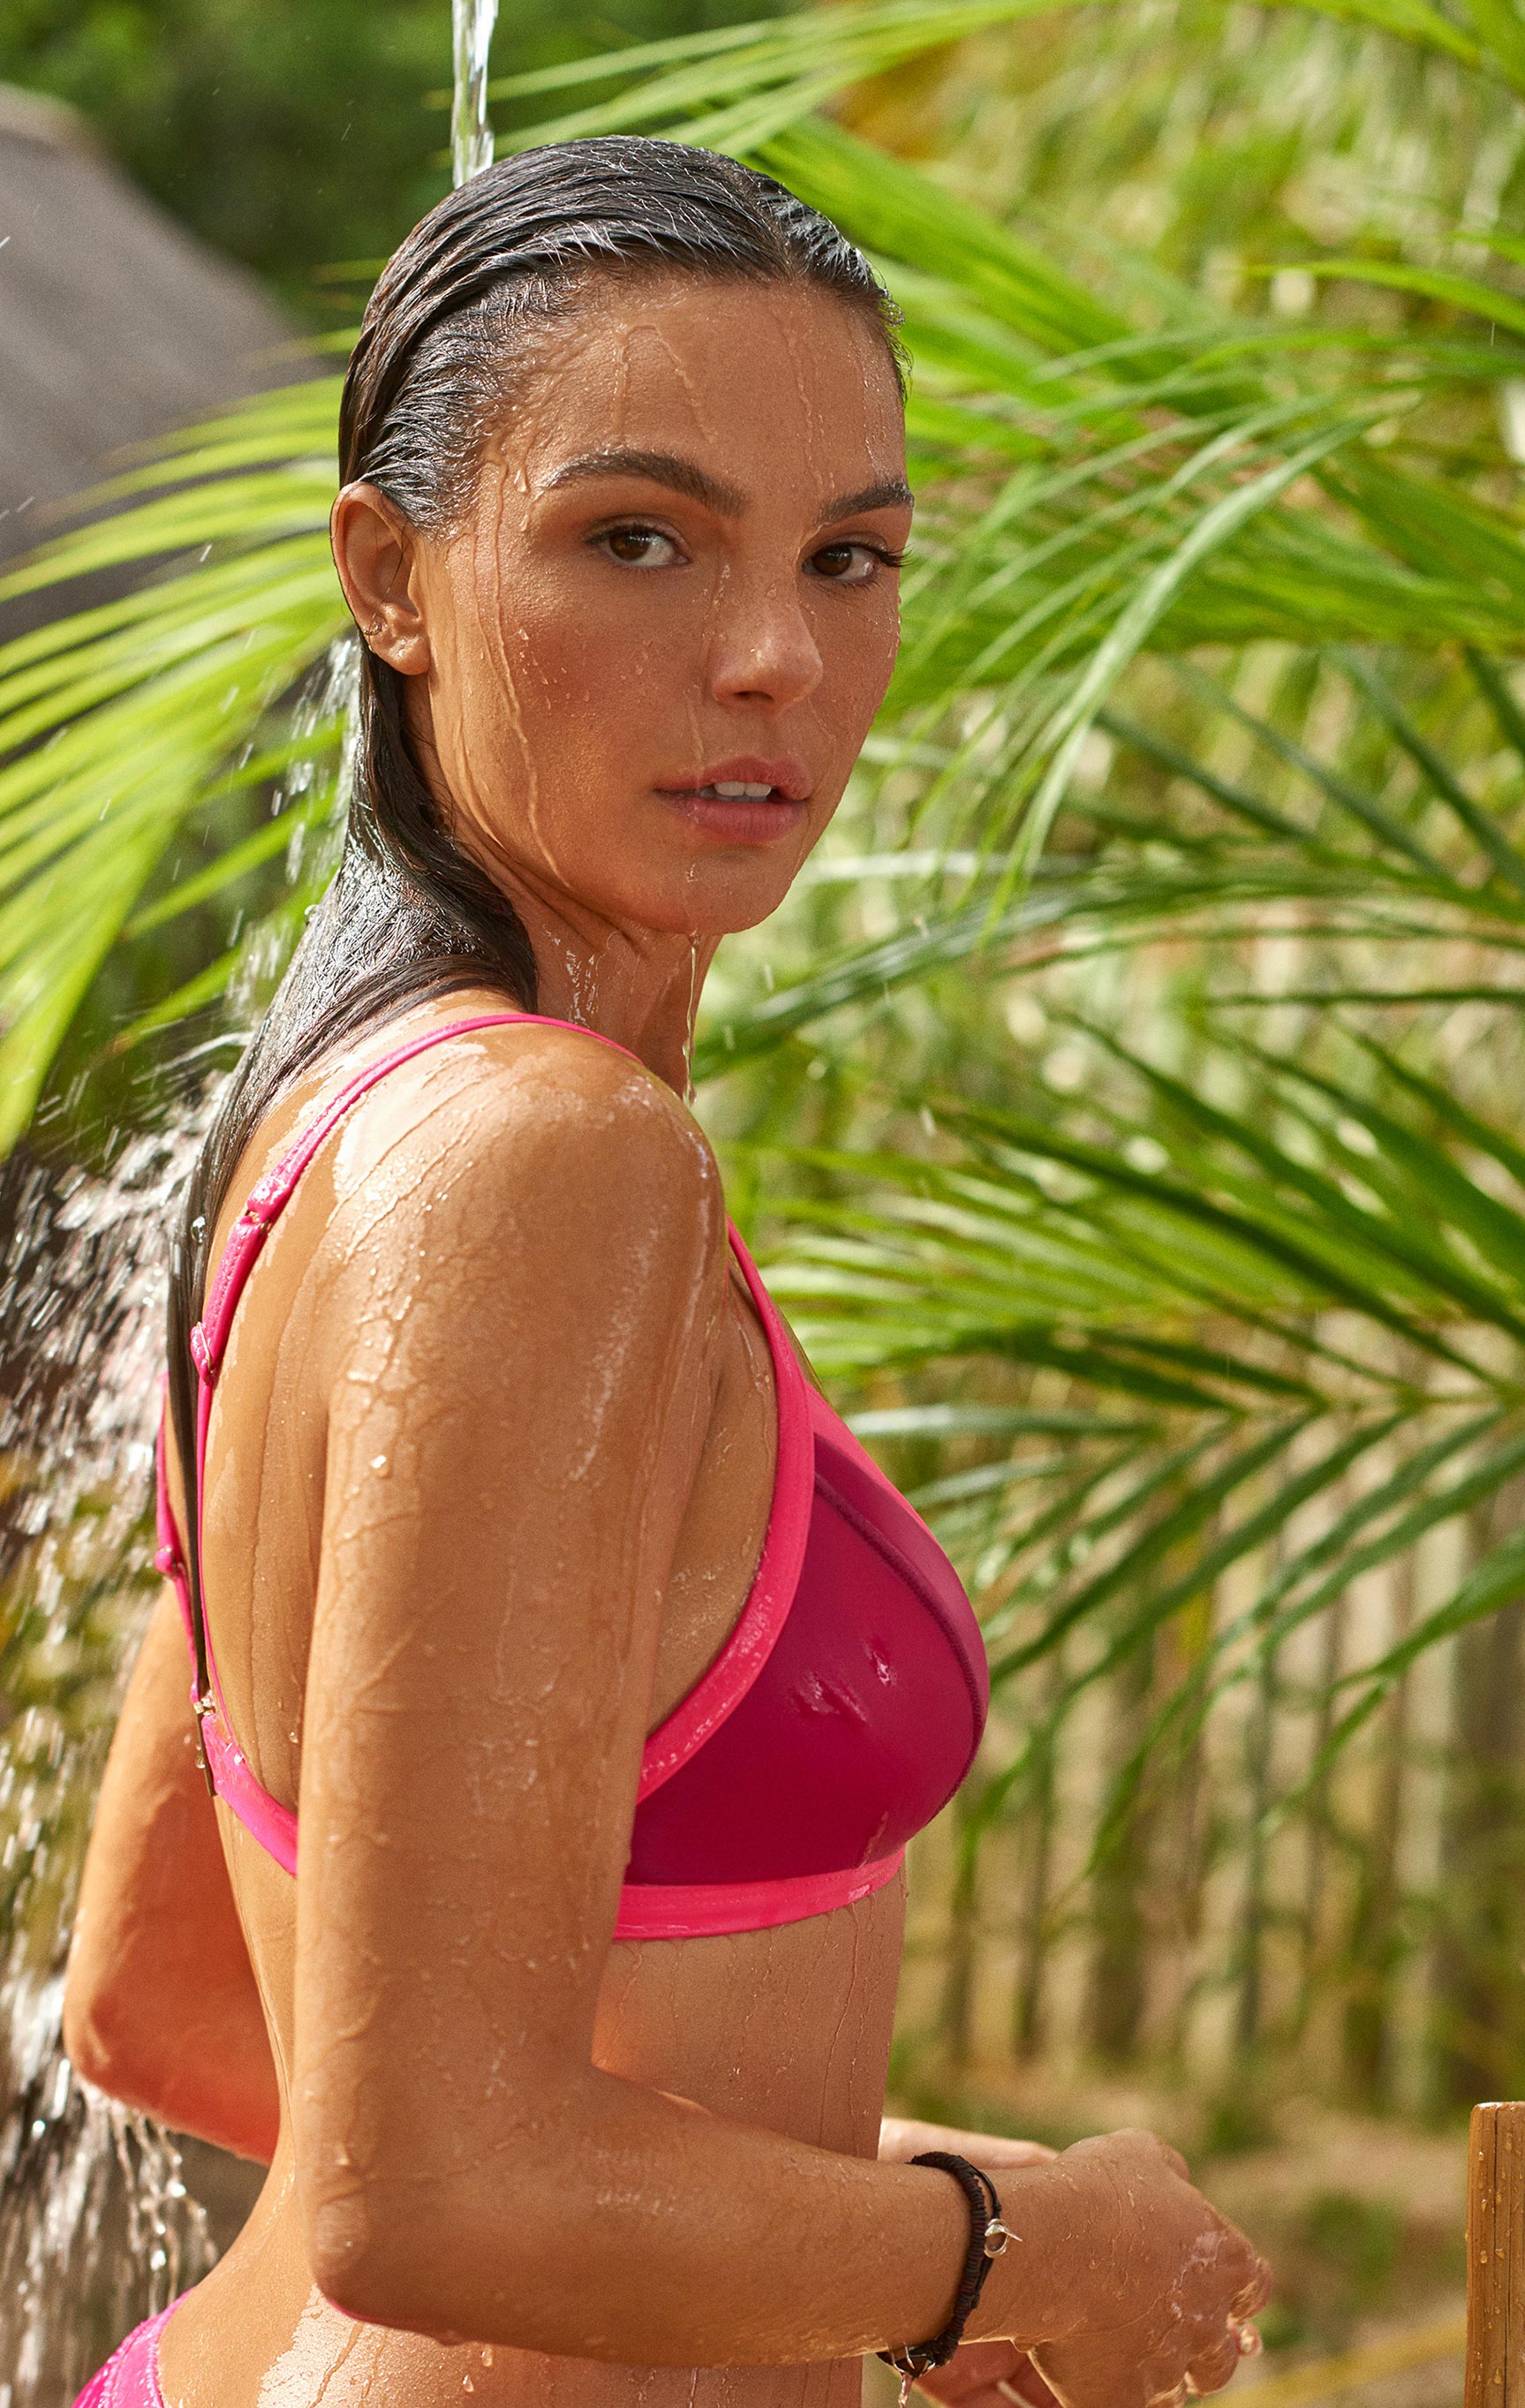 рекламная кампания купальников модного бренда Cia Maritima, сезон весна-лето 2020 / фото 04